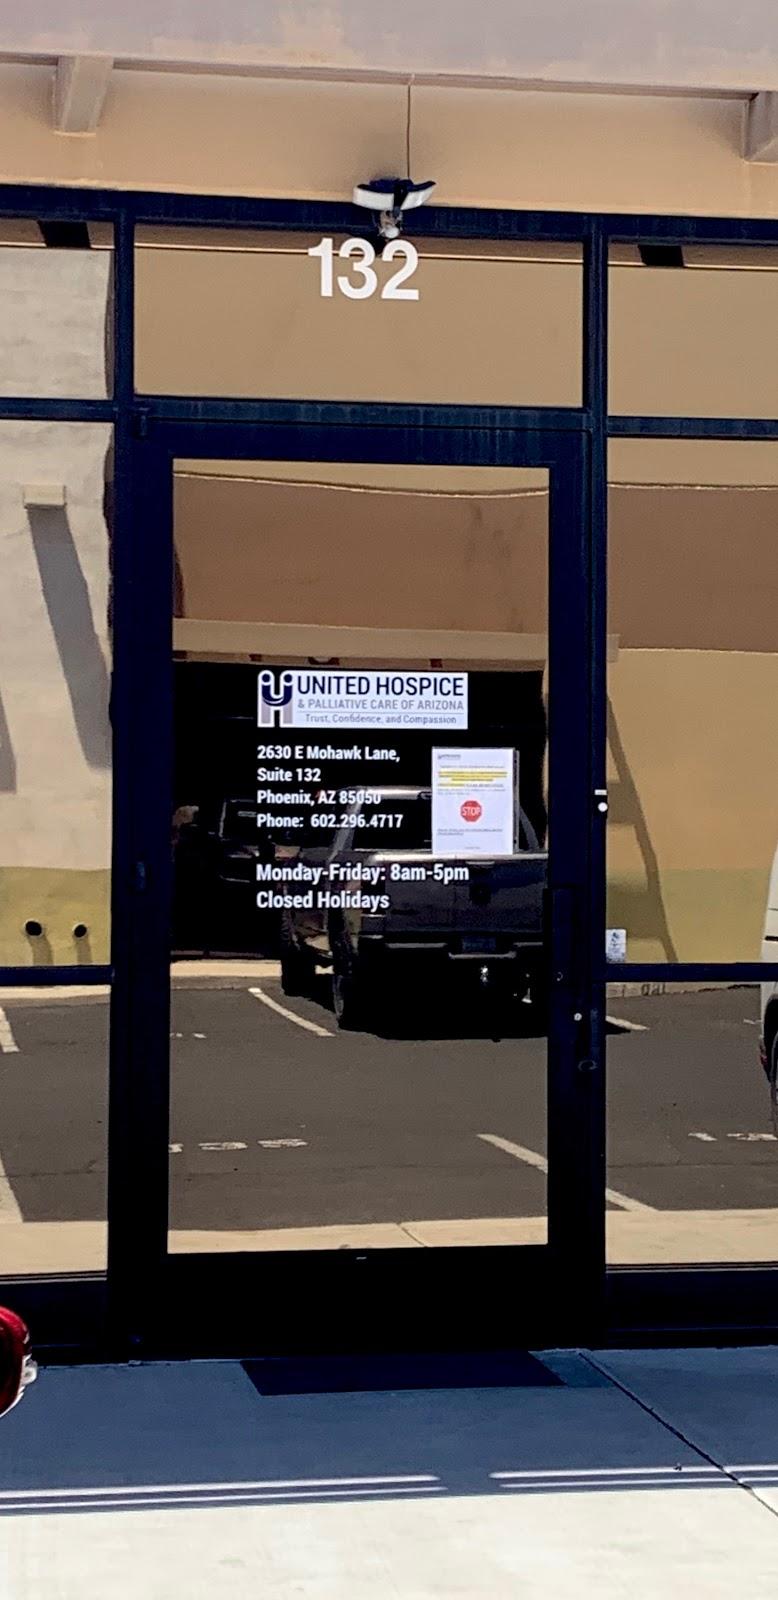 United Hospice & Palliative Care of Arizona - health  | Photo 4 of 6 | Address: 2630 E Mohawk Ln Suite 132, Phoenix, AZ 85050, USA | Phone: (602) 296-4717